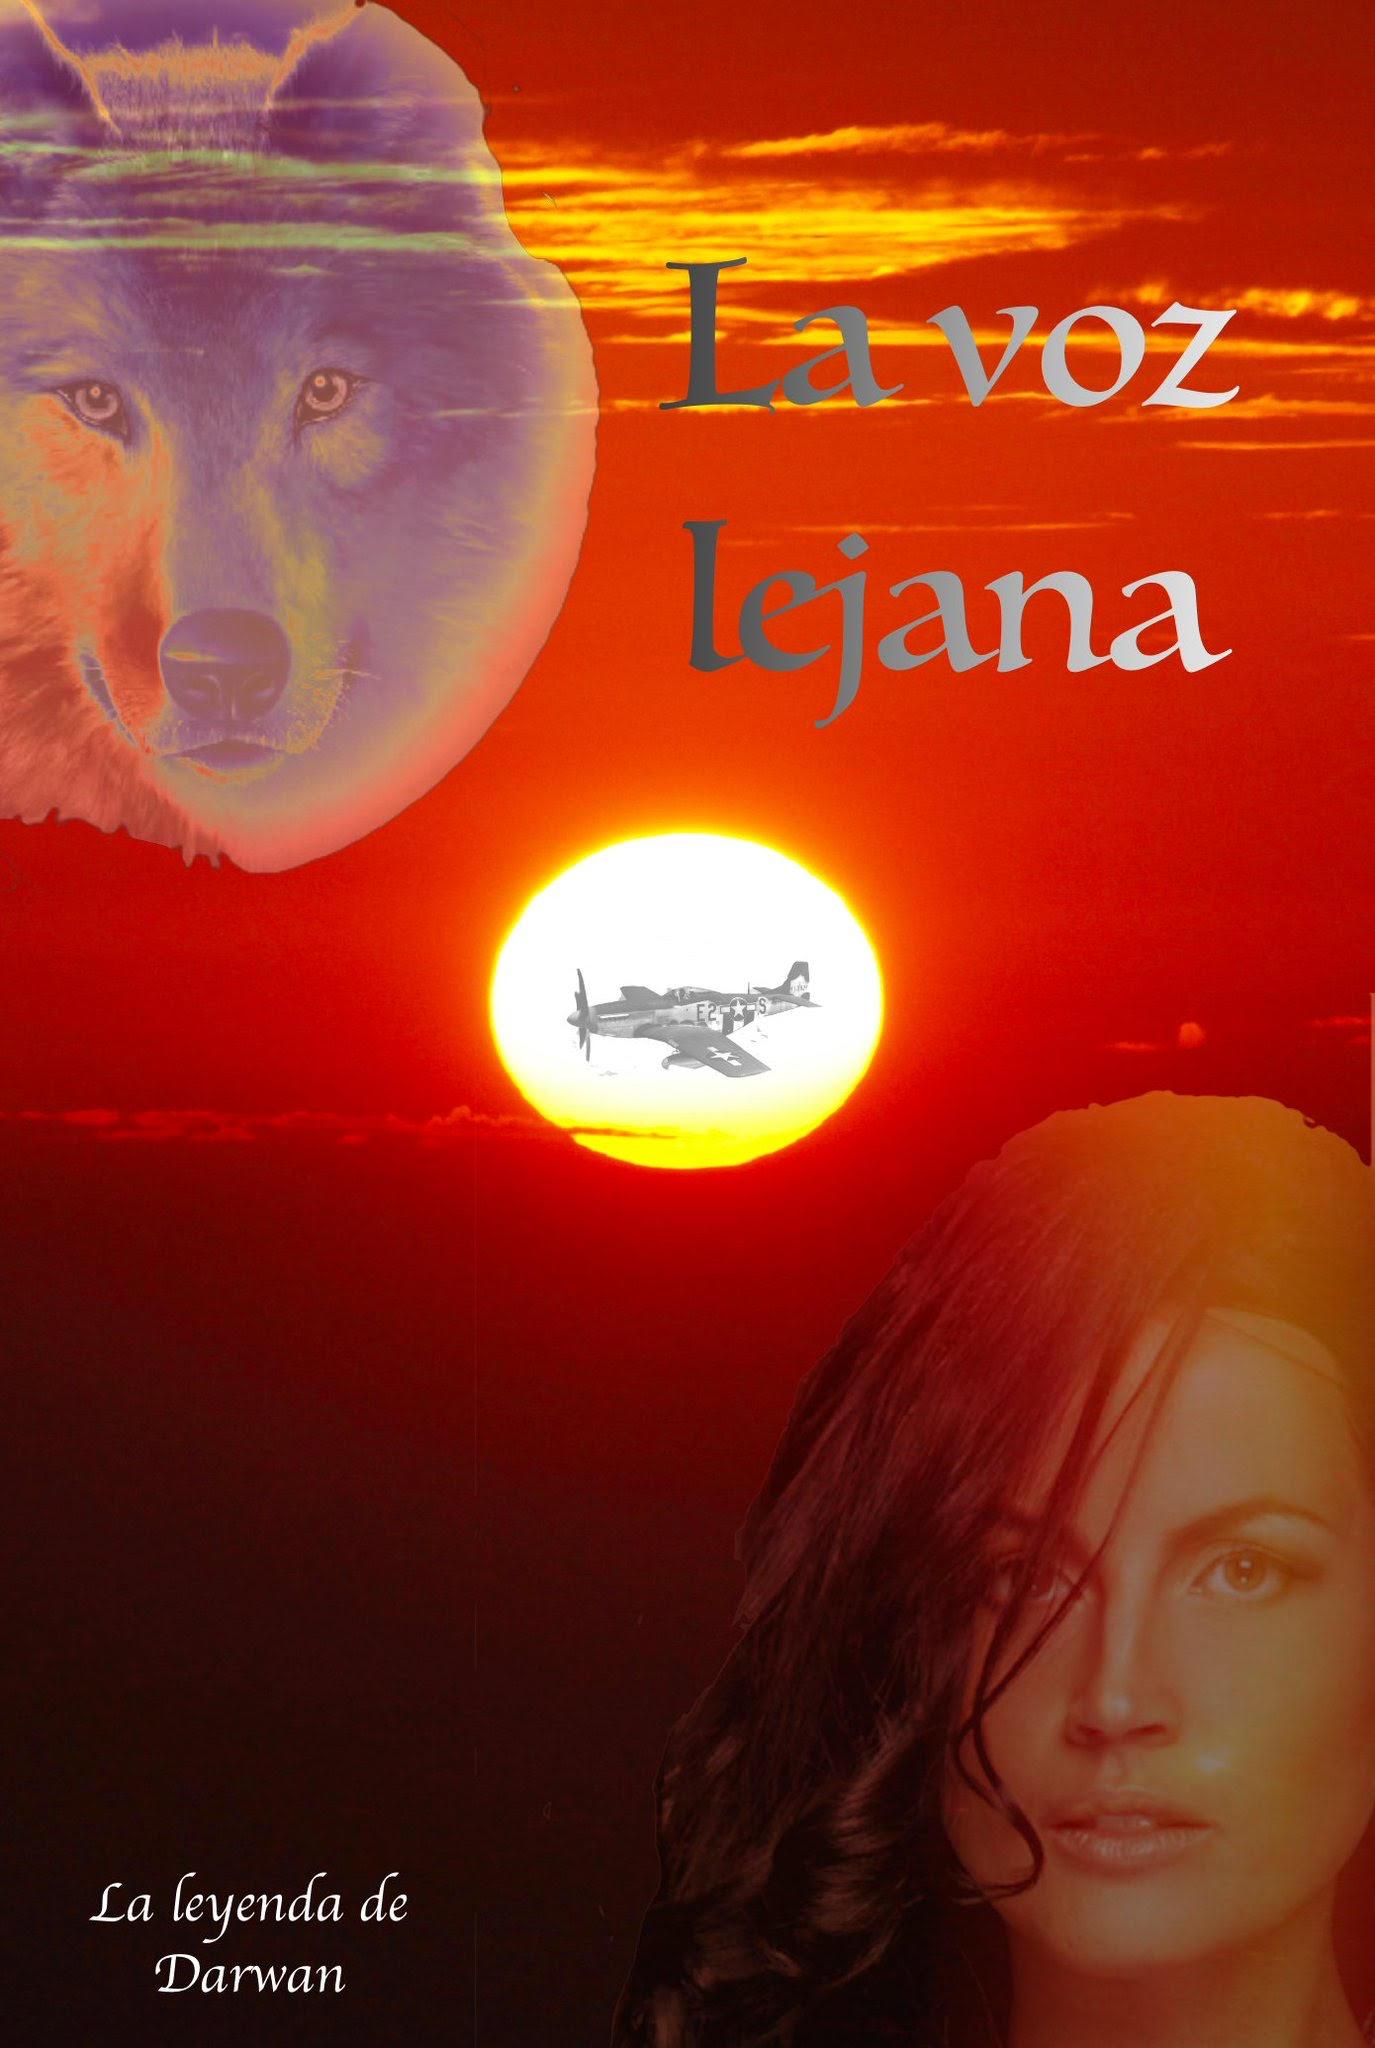 la_voz_lejana